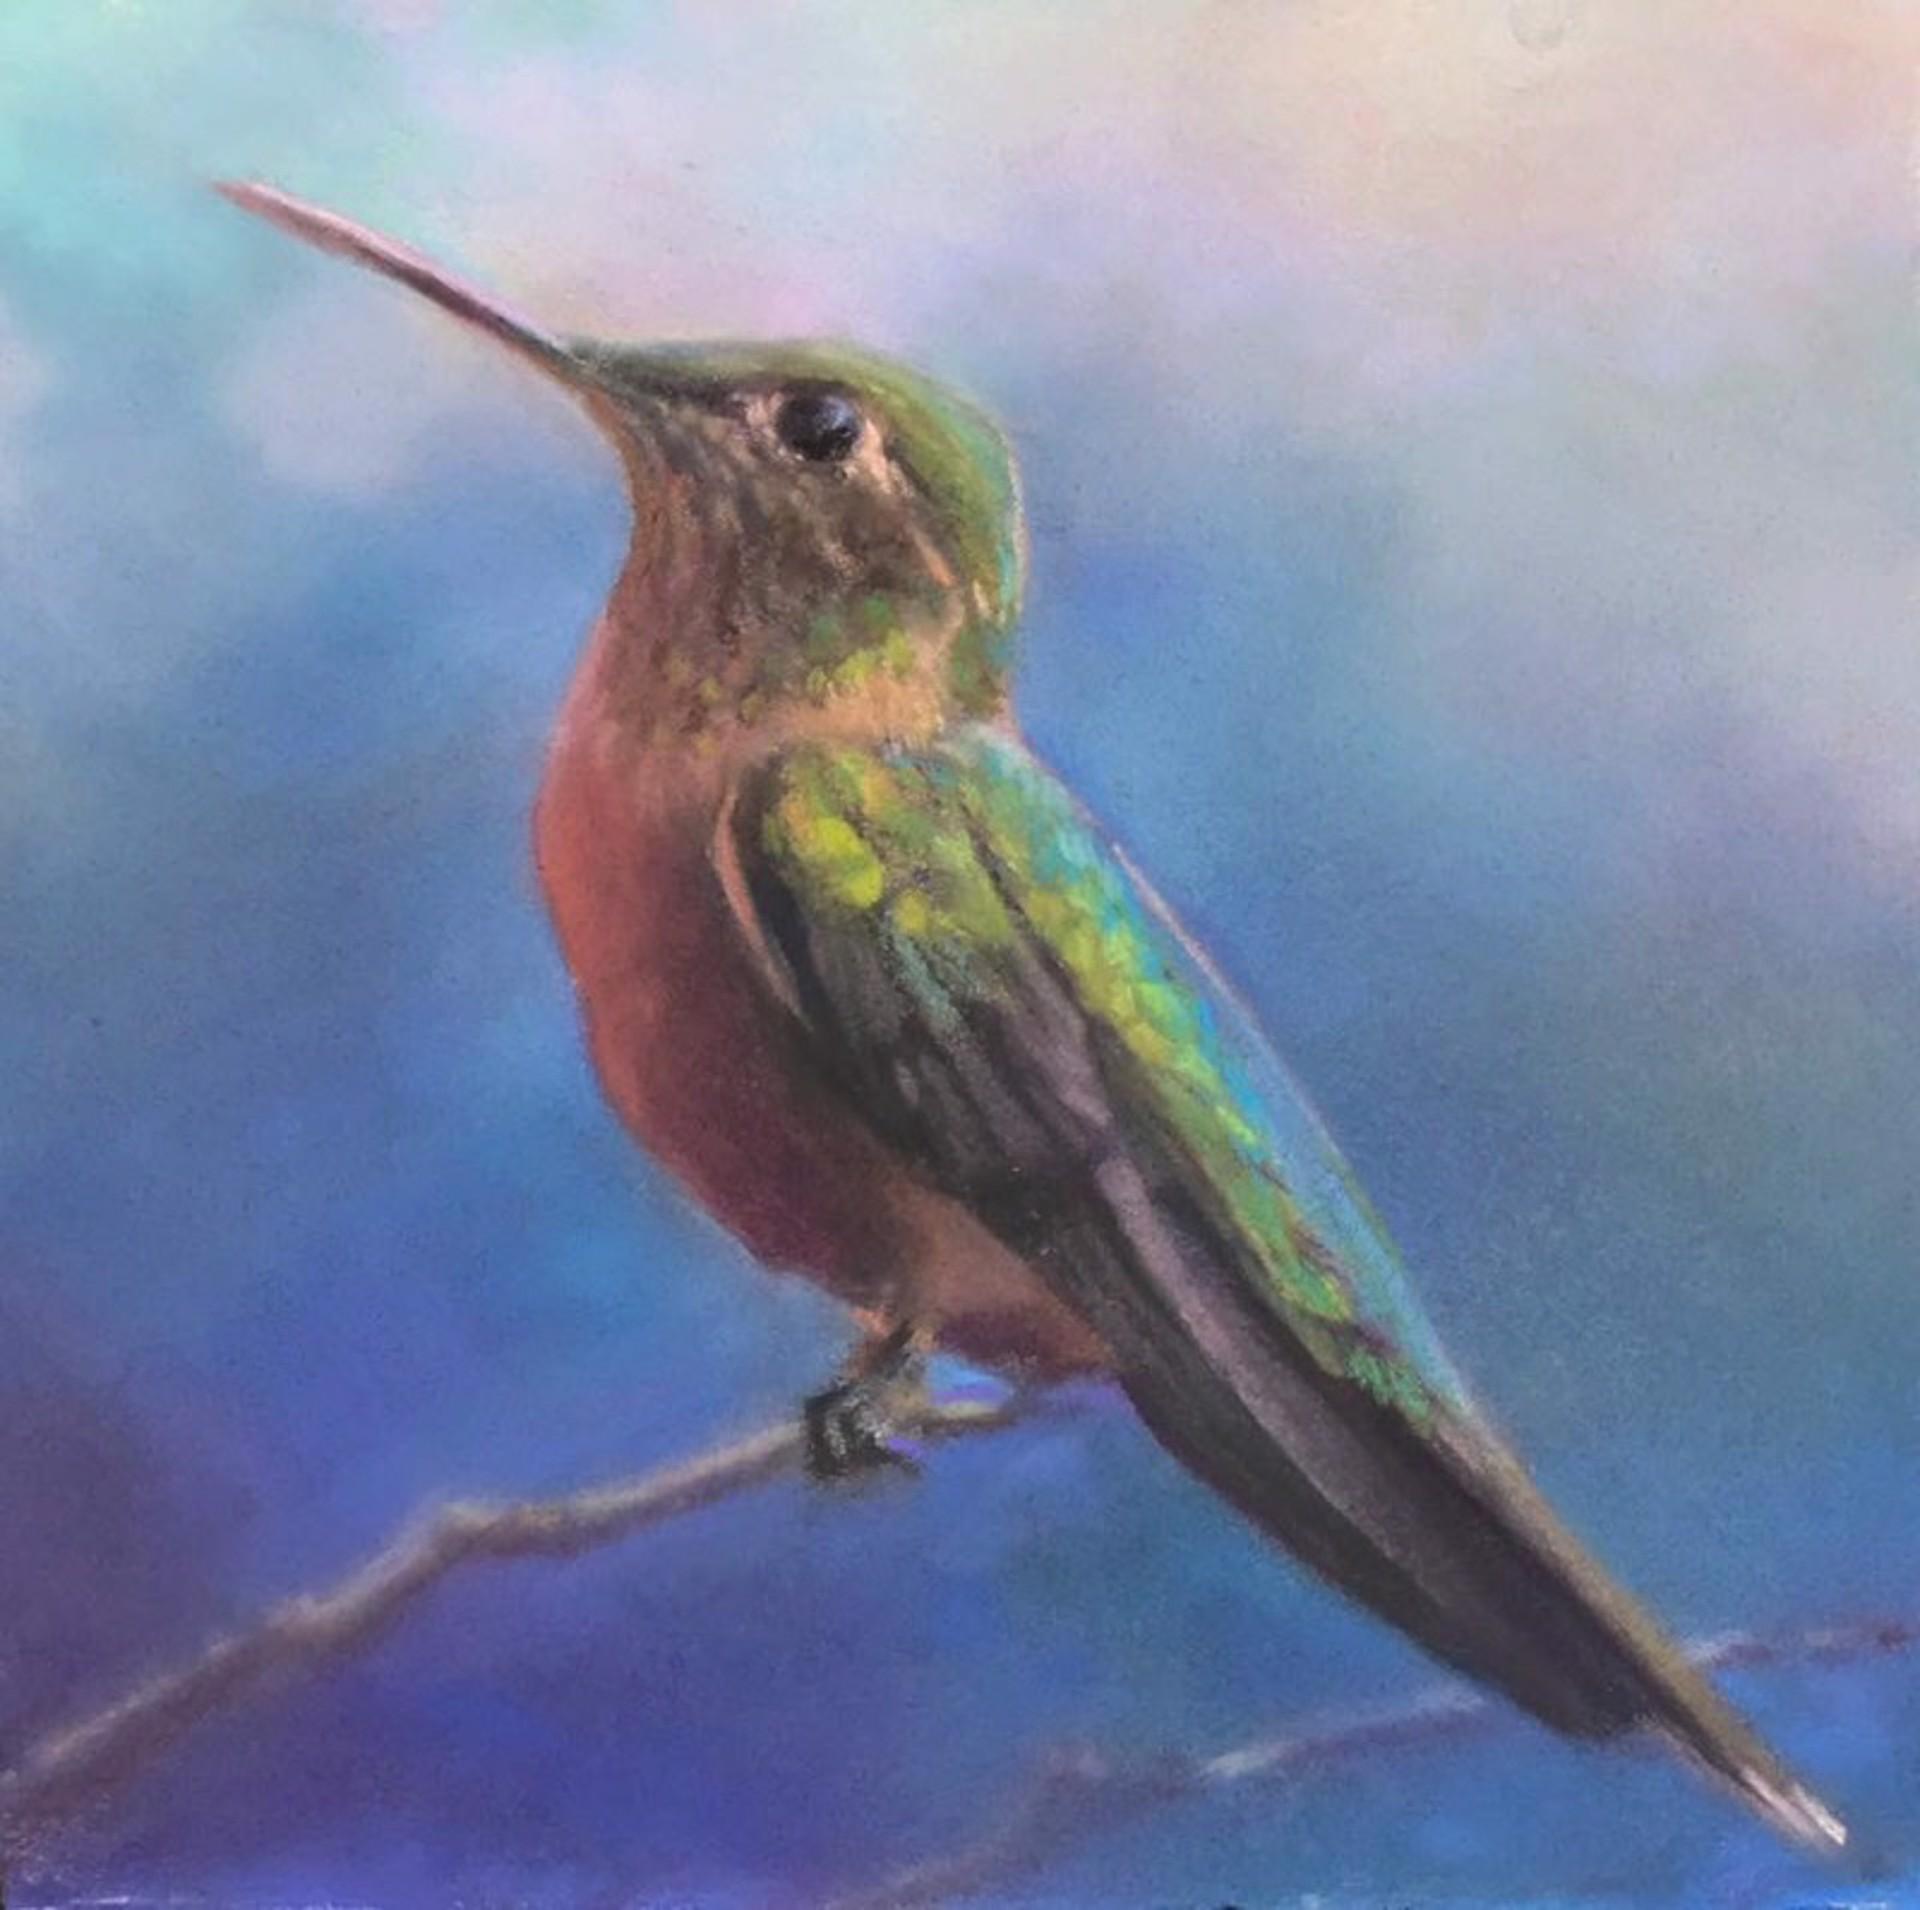 Hummingbird commission 1 by Bruce A Gómez